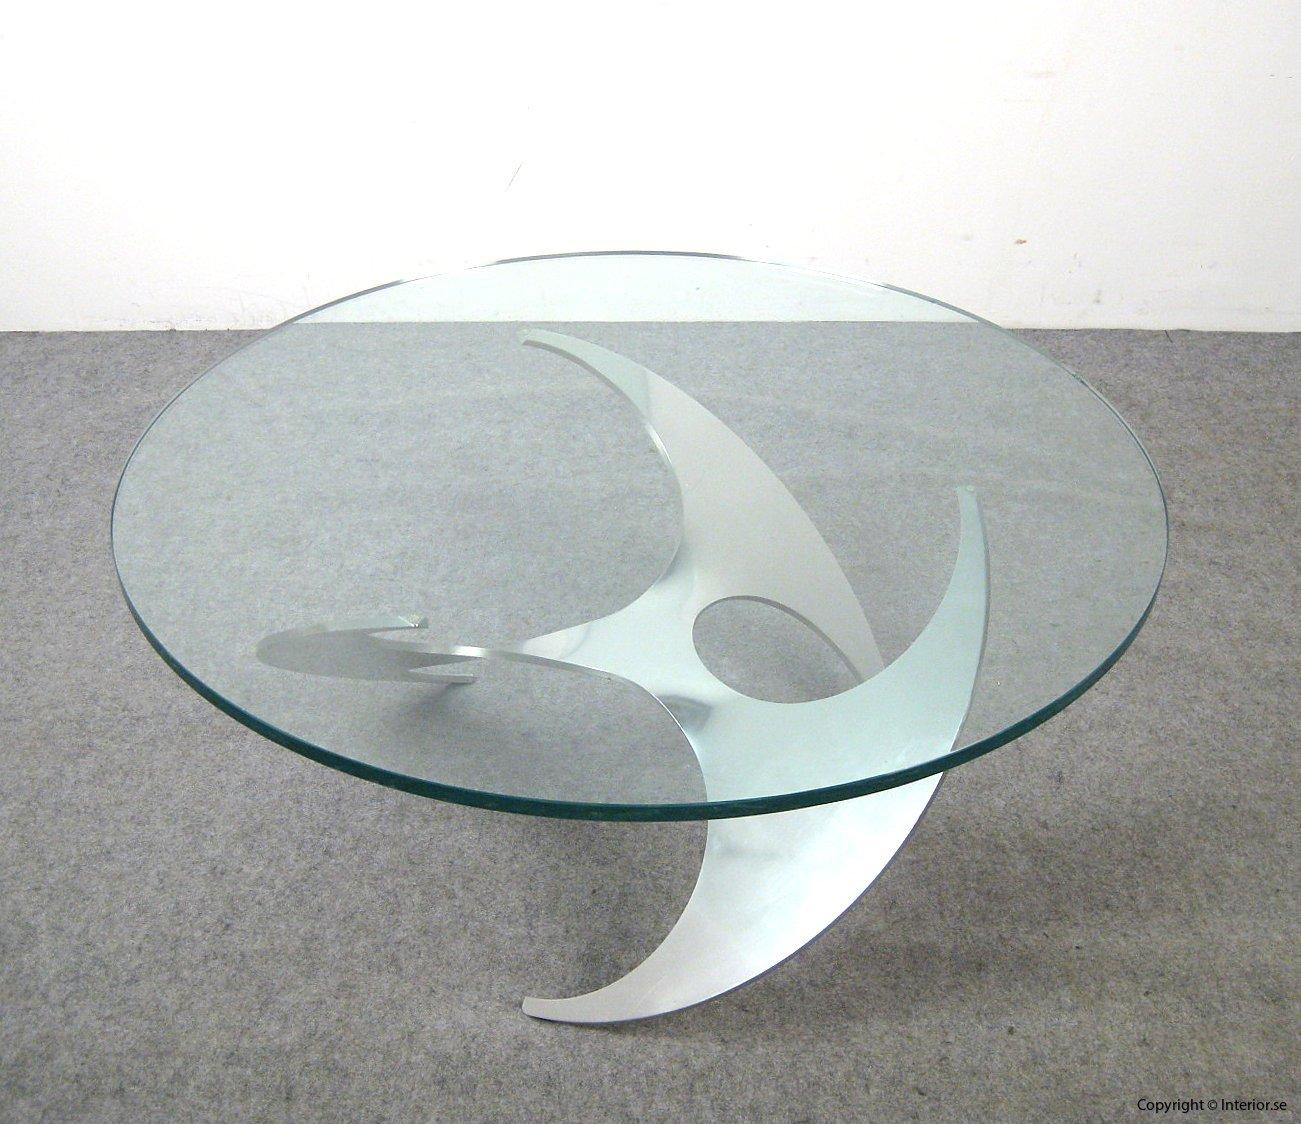 Soffbord coffee table couchtisch, Ronald Schmitt Propeller - Knut Hesterberg 3